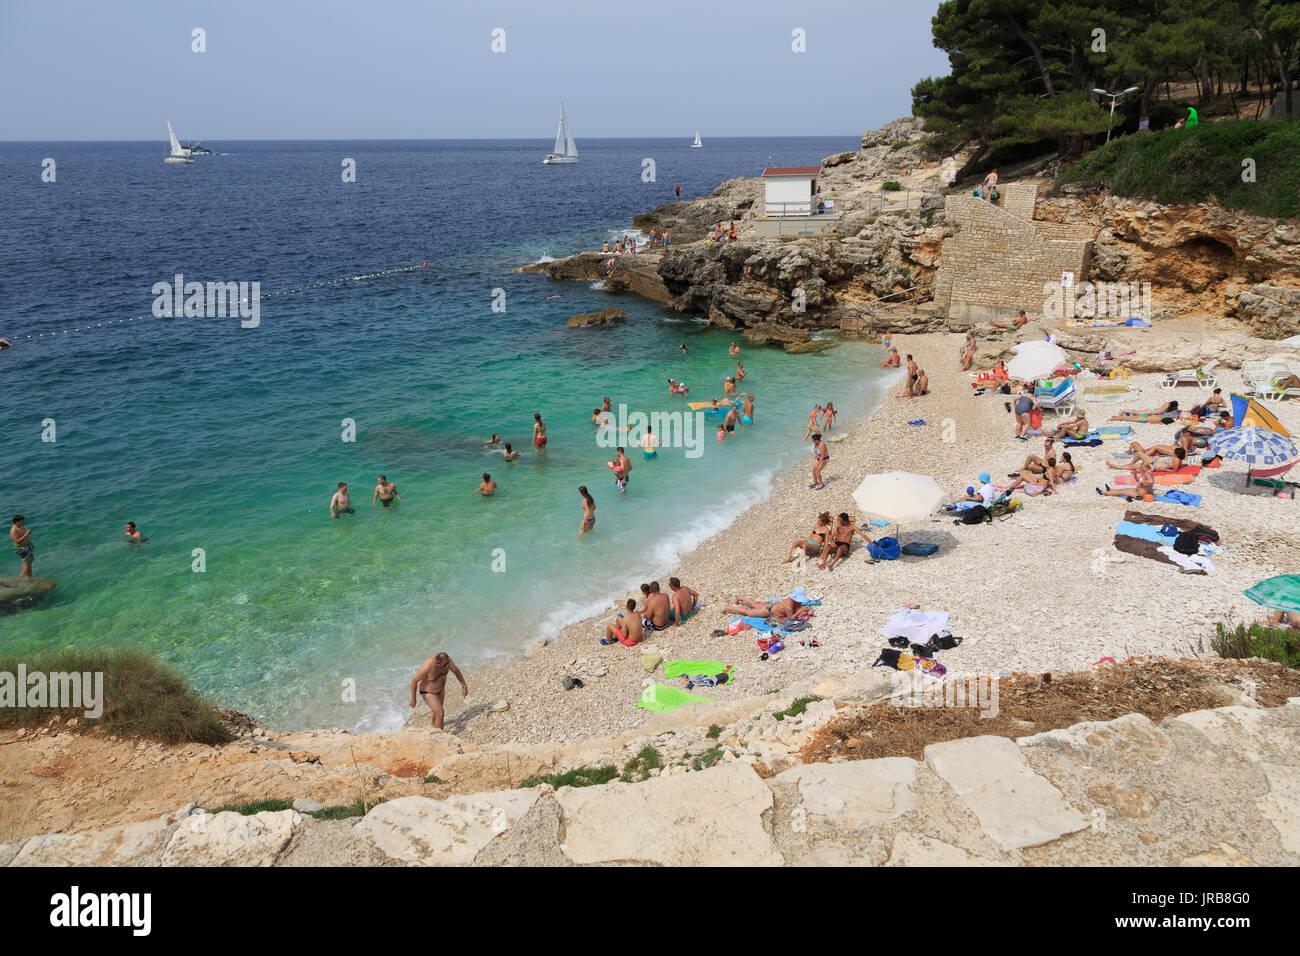 A beach in Verudela, Pula, Croatia - Stock Image